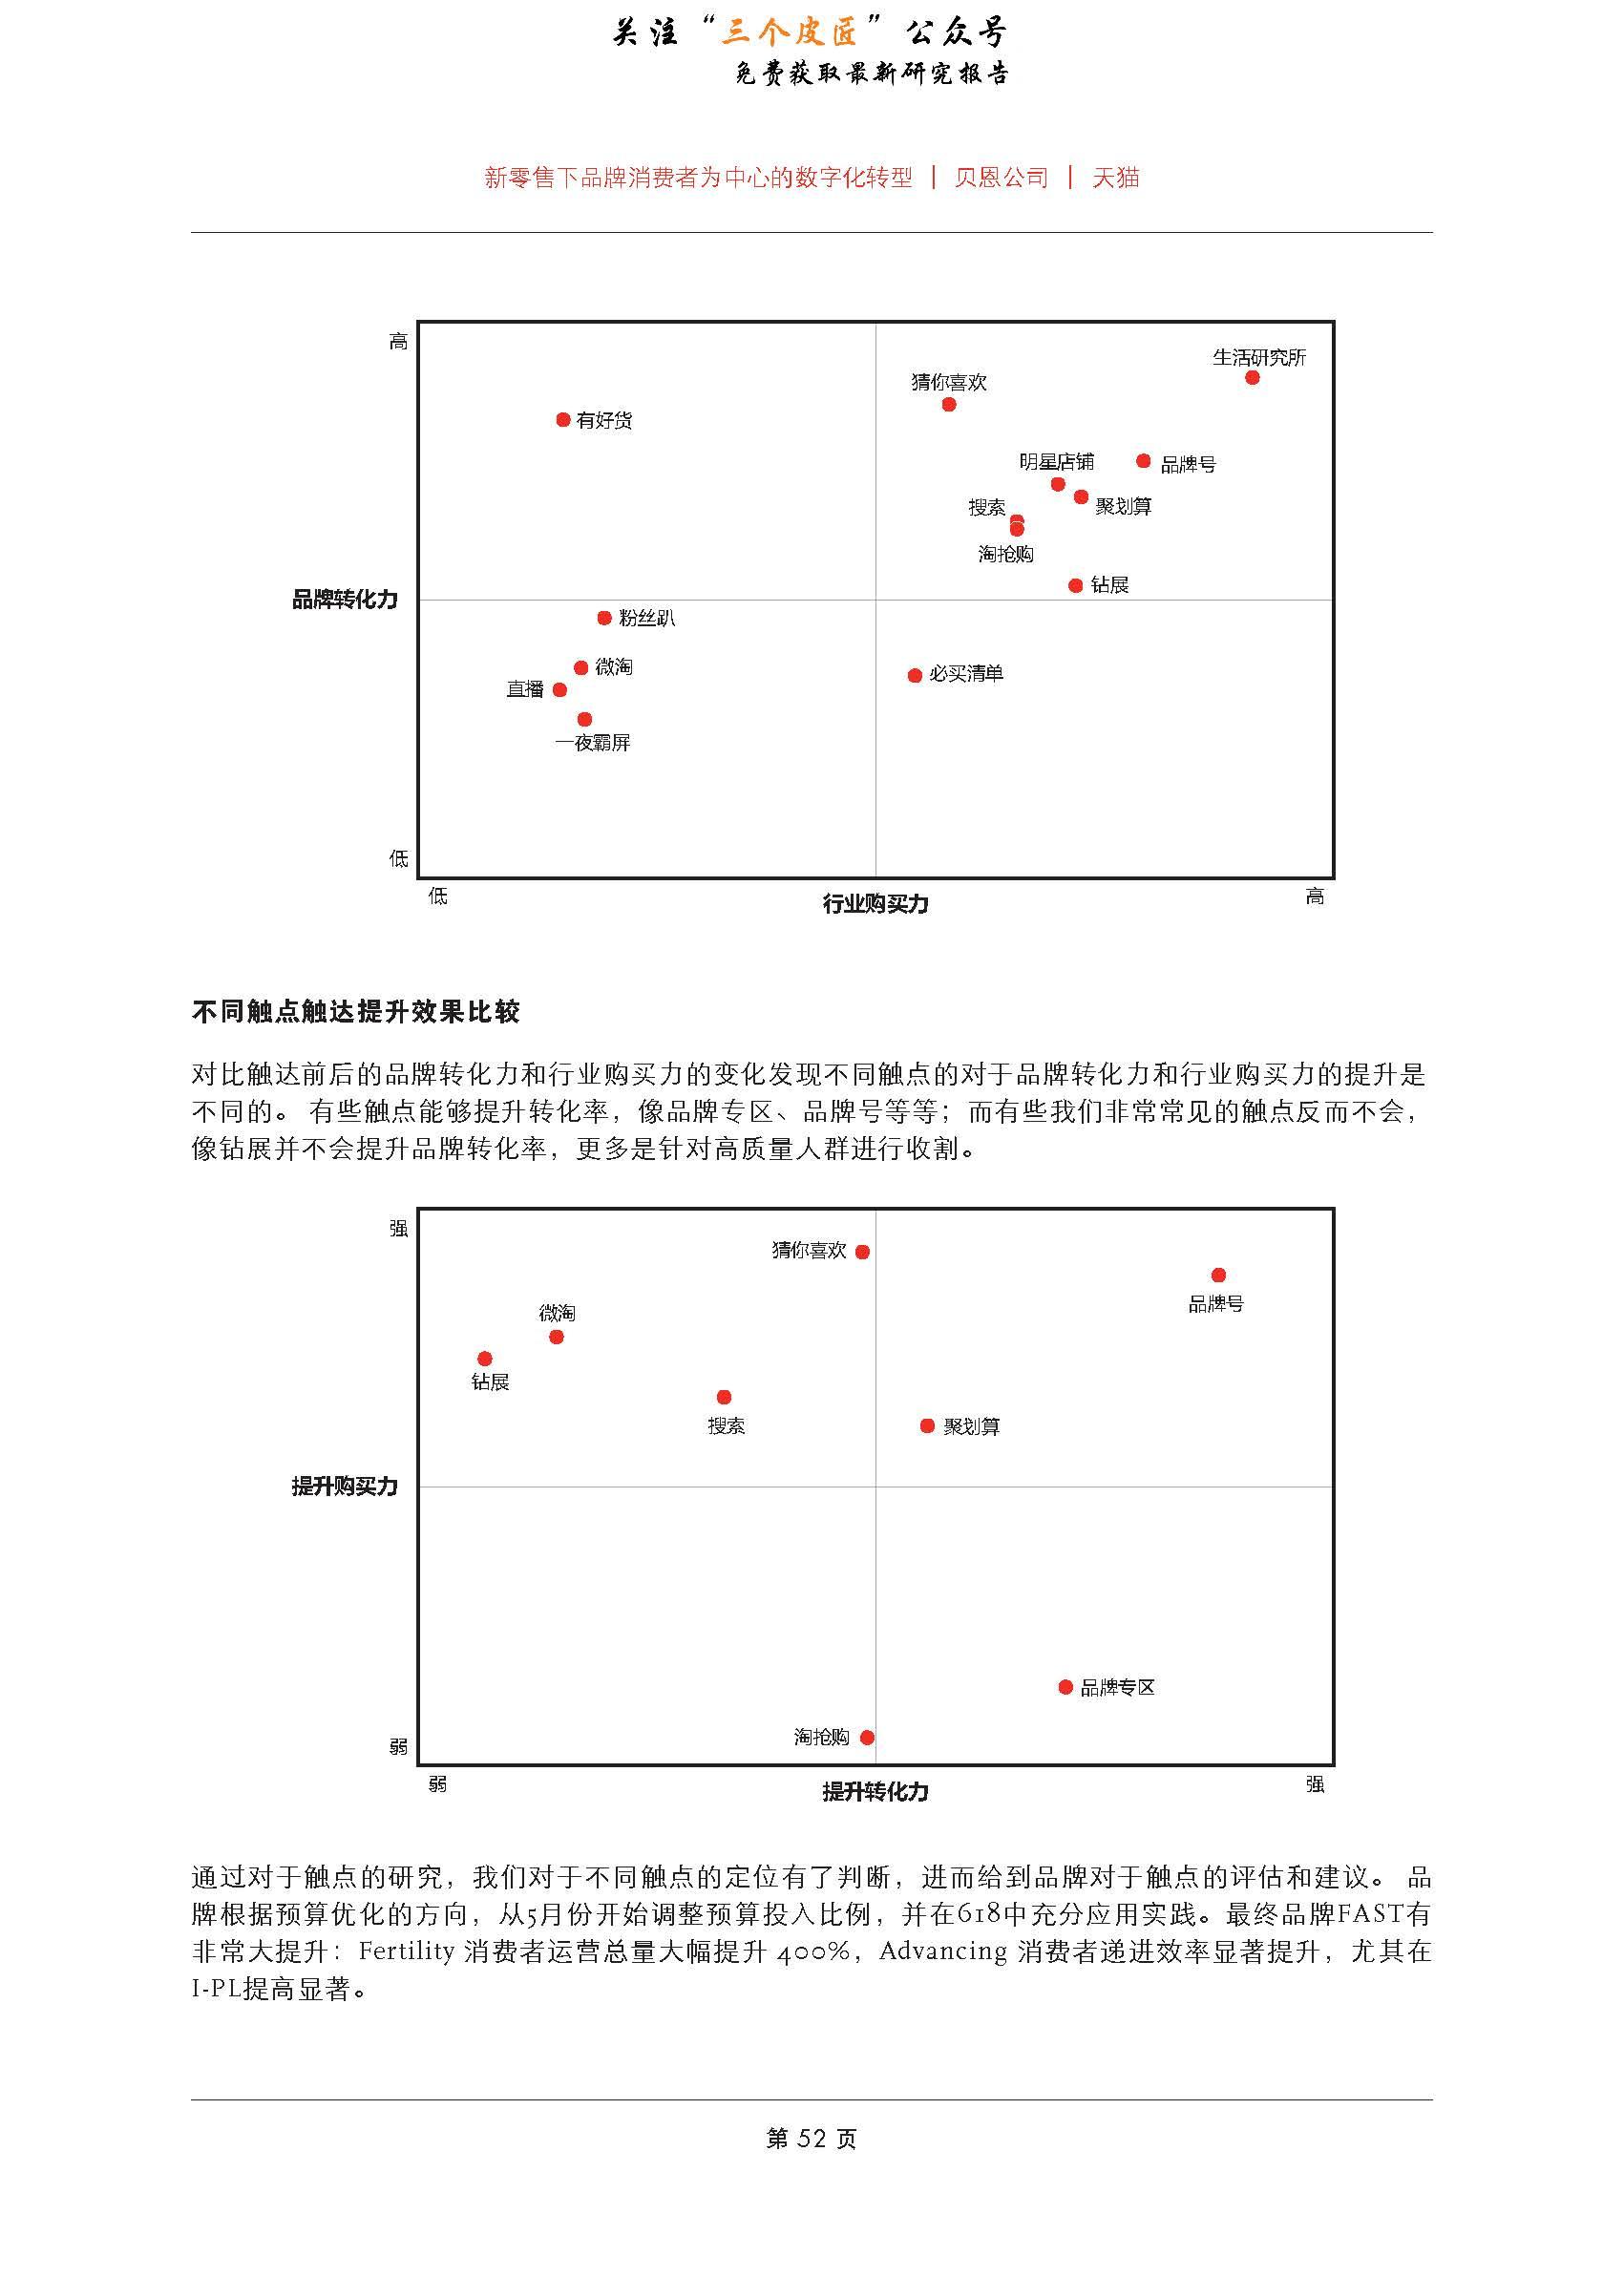 1_Page_54.jpg